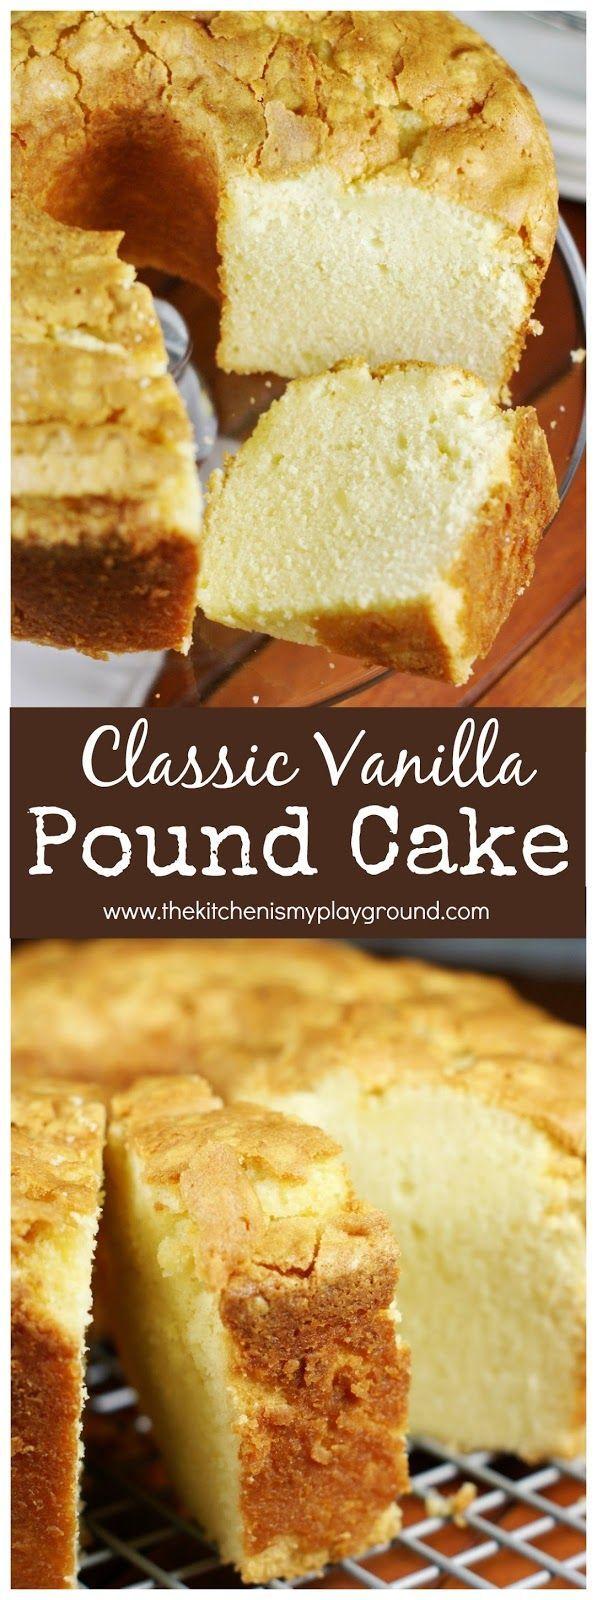 Classic Vanilla Pound Cake Pin Image